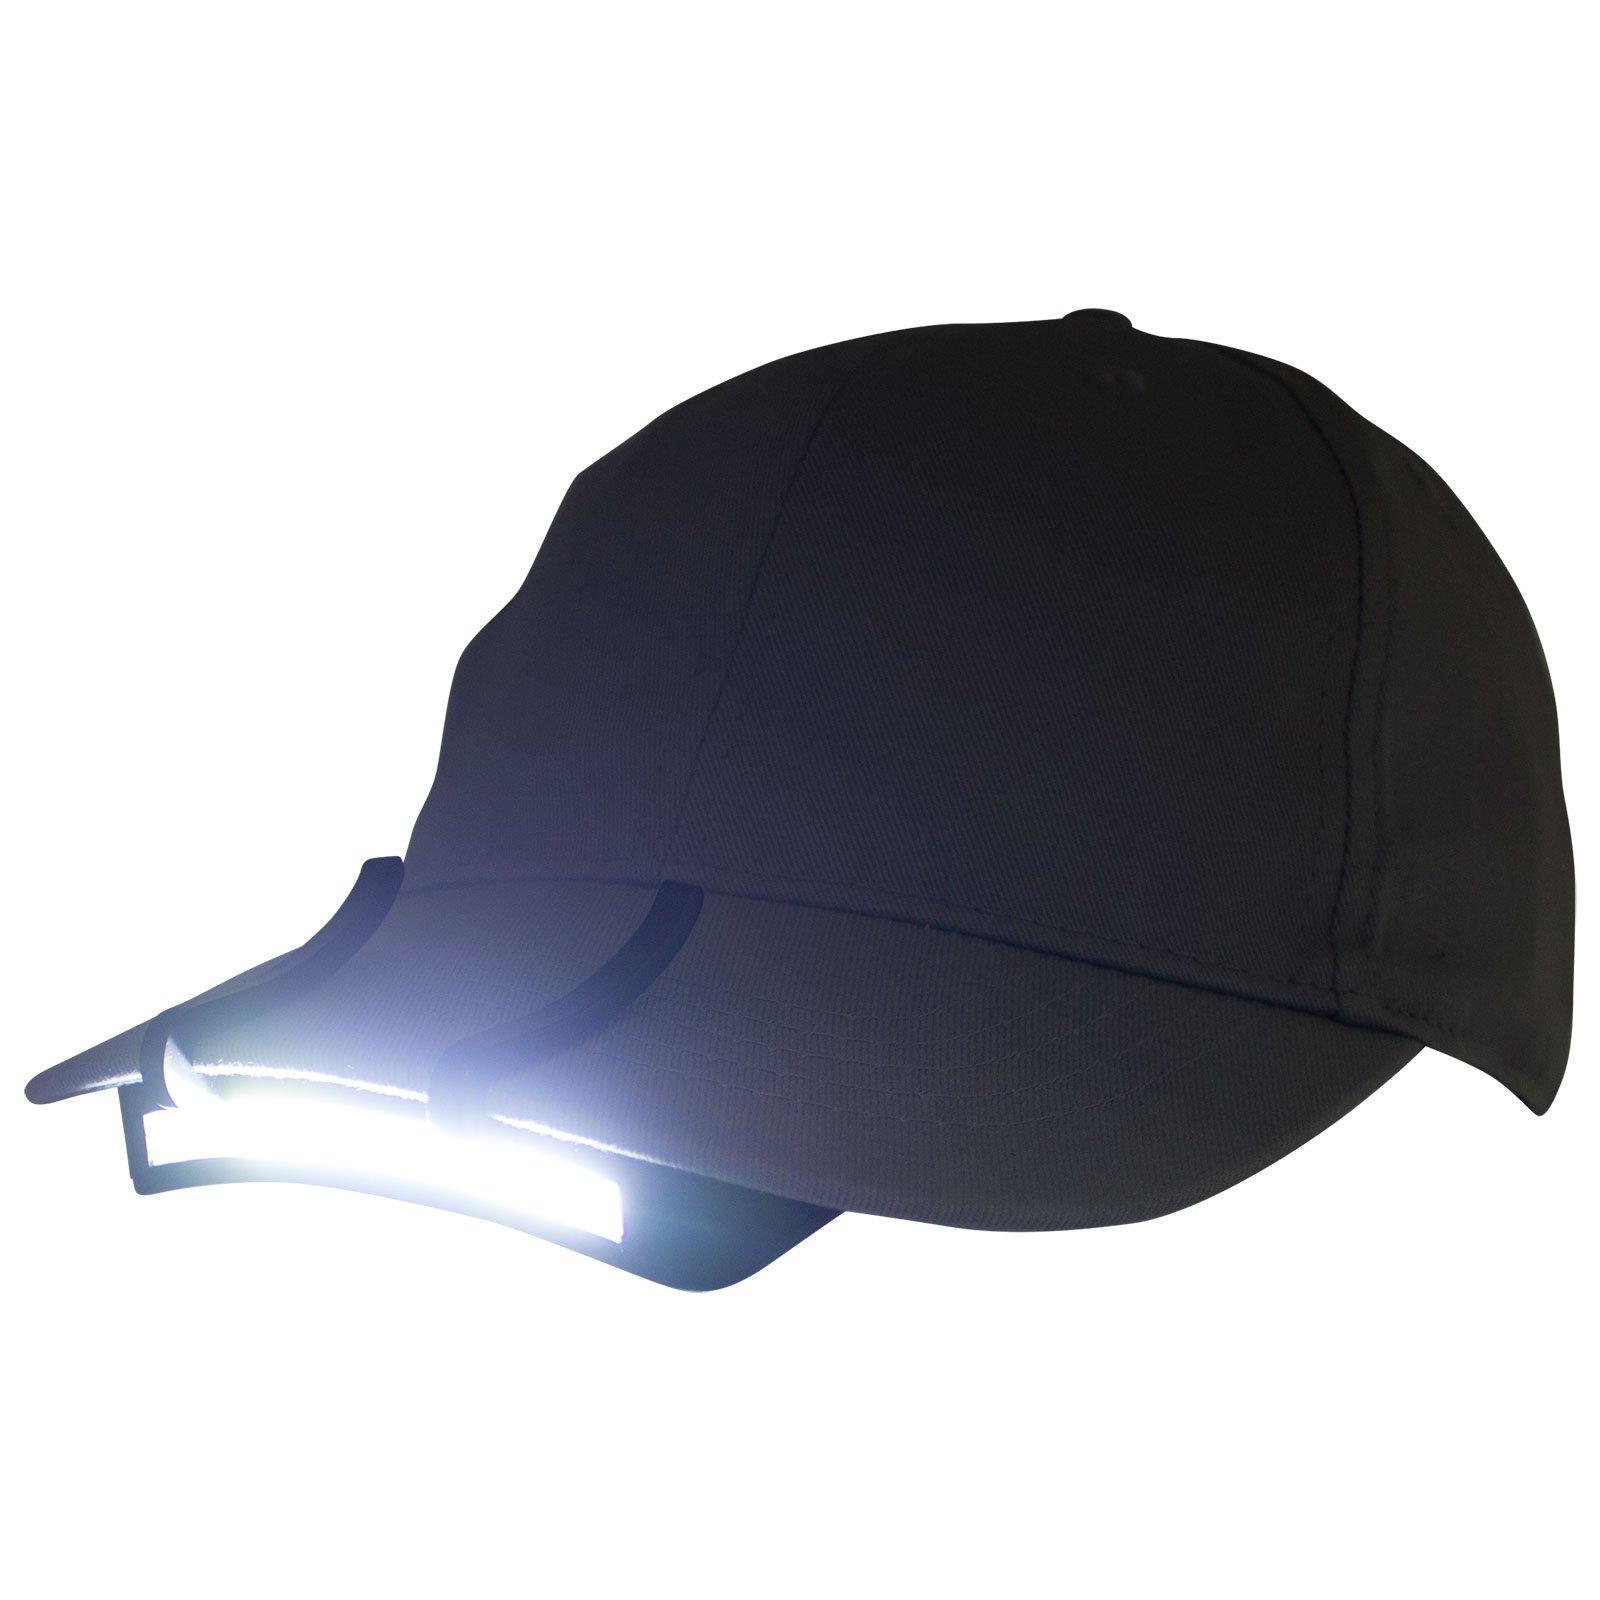 2 PACK - 400 Lumen Hi Mode / 180 Lumen Low Power Mode (2 X Cap Lights > 2 X Power & 2 X Bright) COB LED Clip On Cap Light DOUBLE BRIGHT (100% MFG Guarantee) (Black) by Apollo's Products (Image #5)